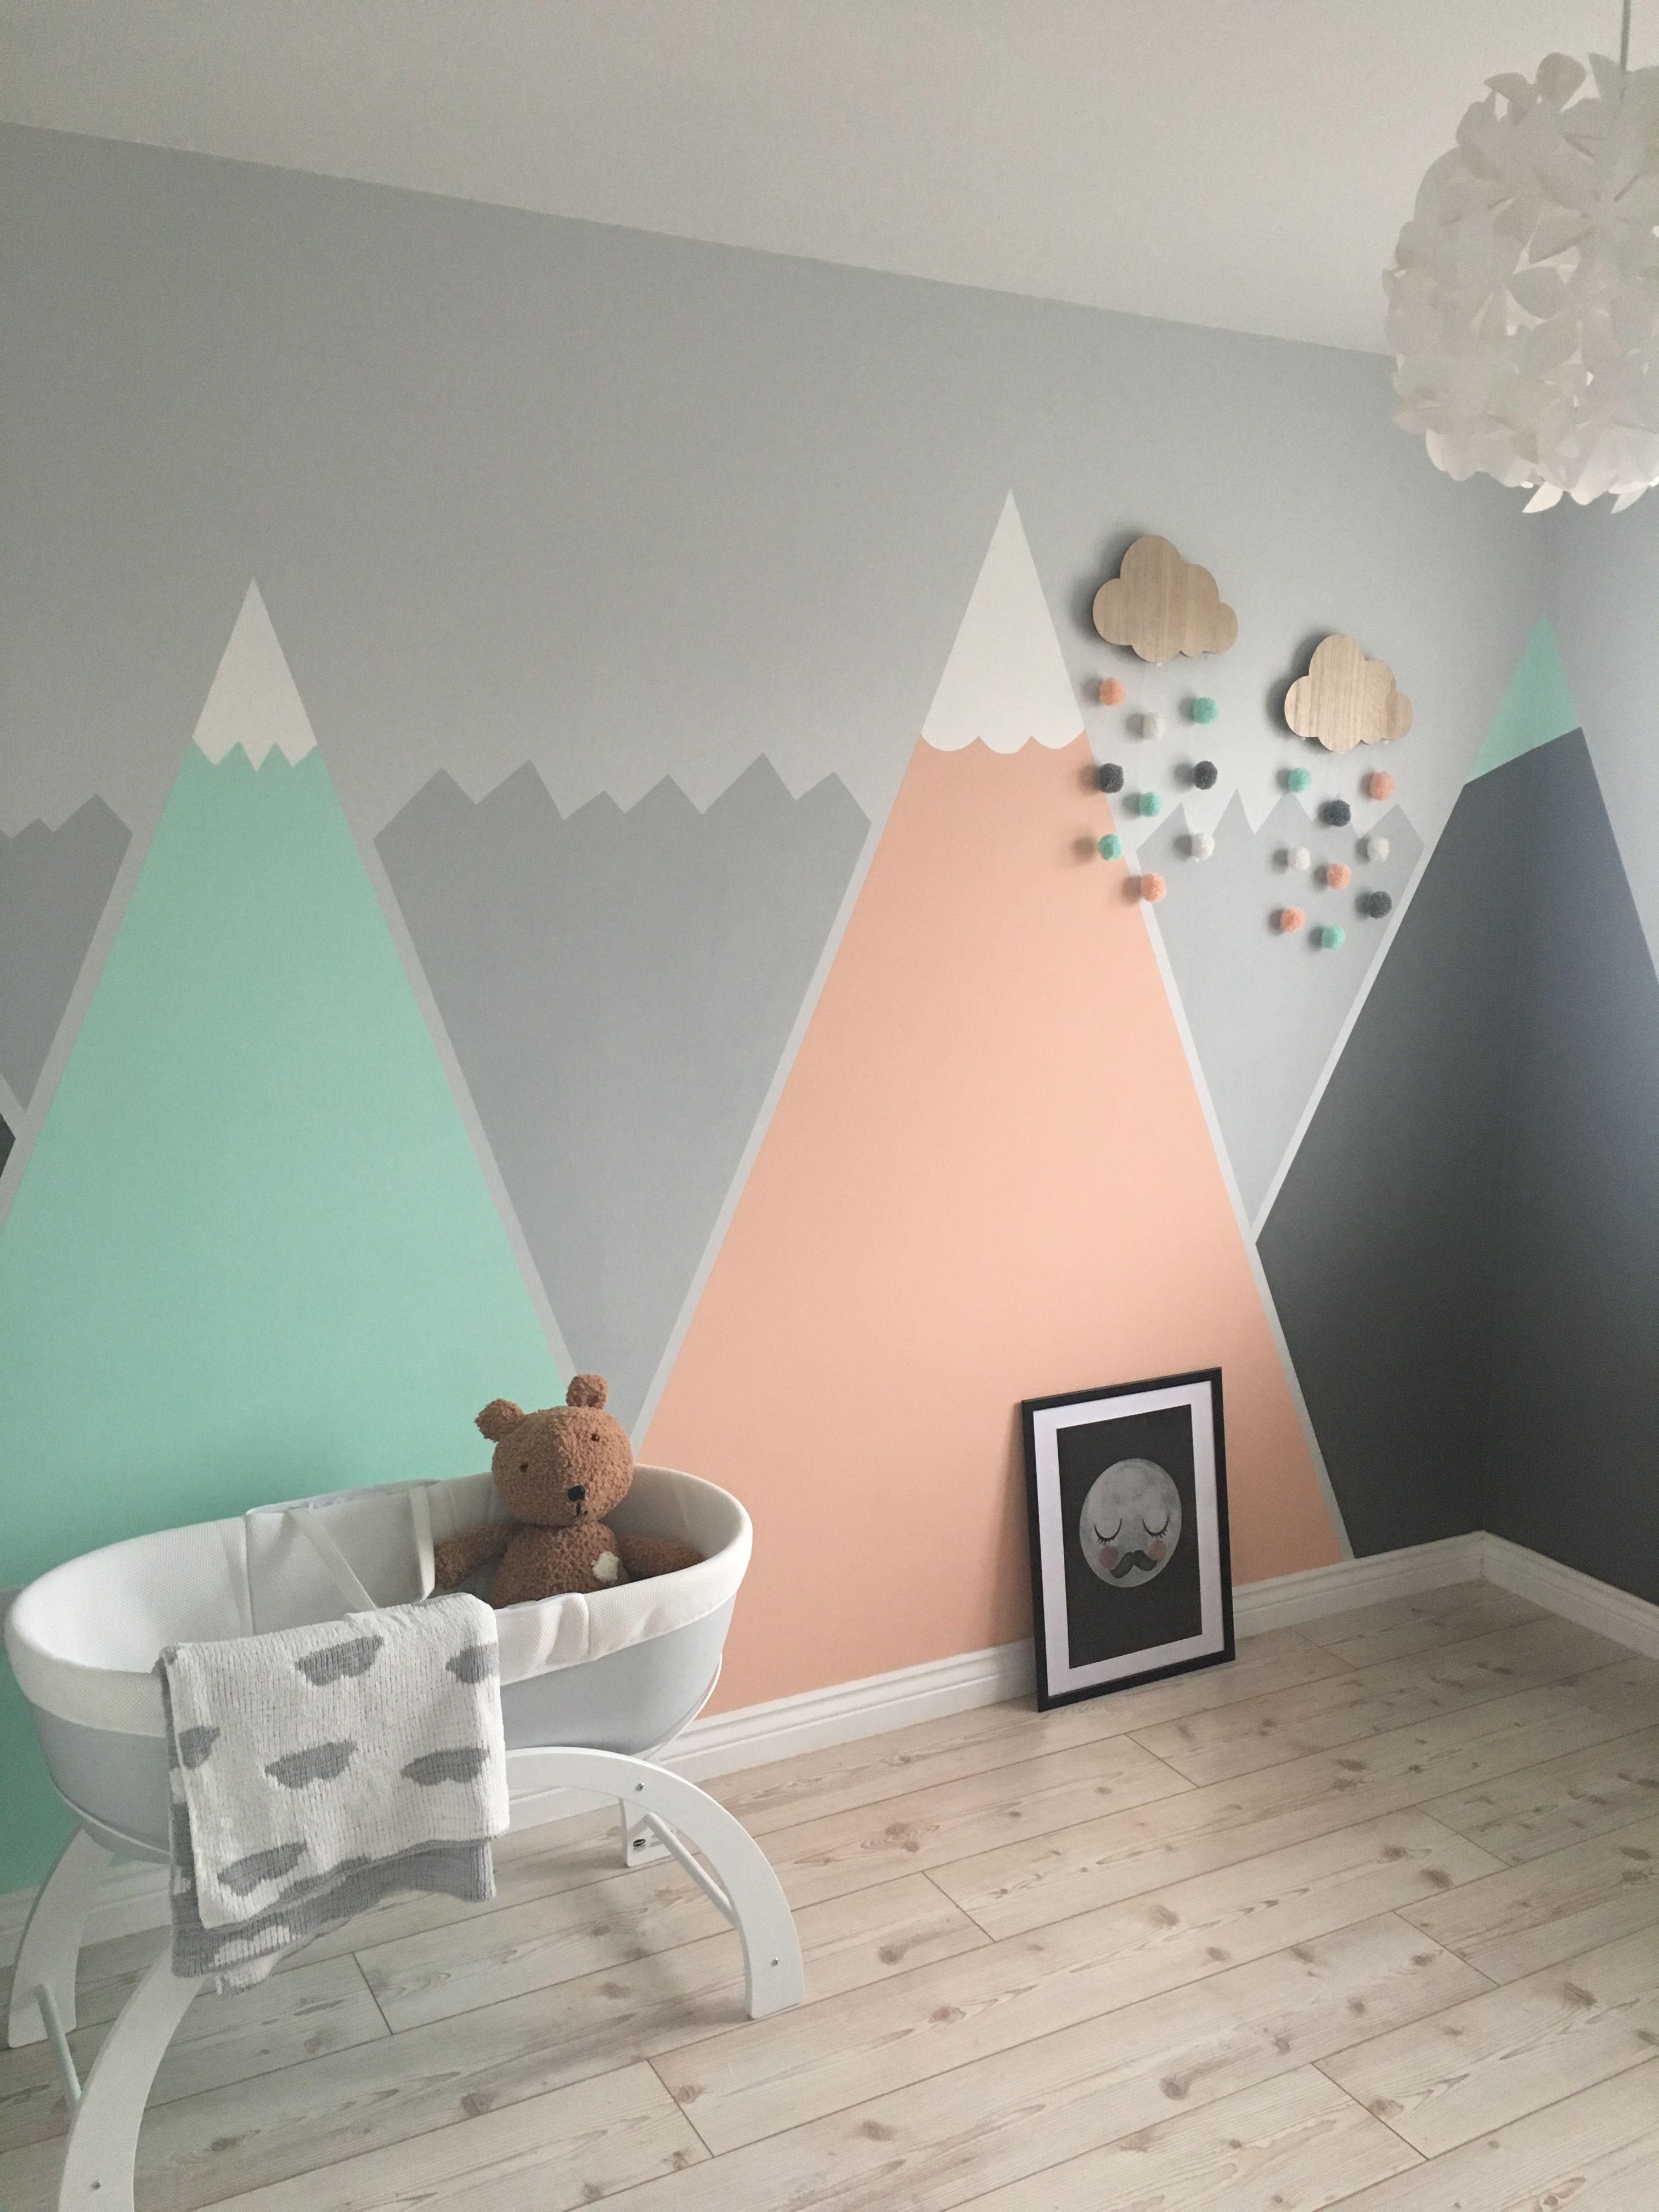 Our girl\'s nursery so far! Peach, grey and mint mountains | Baby oh ...